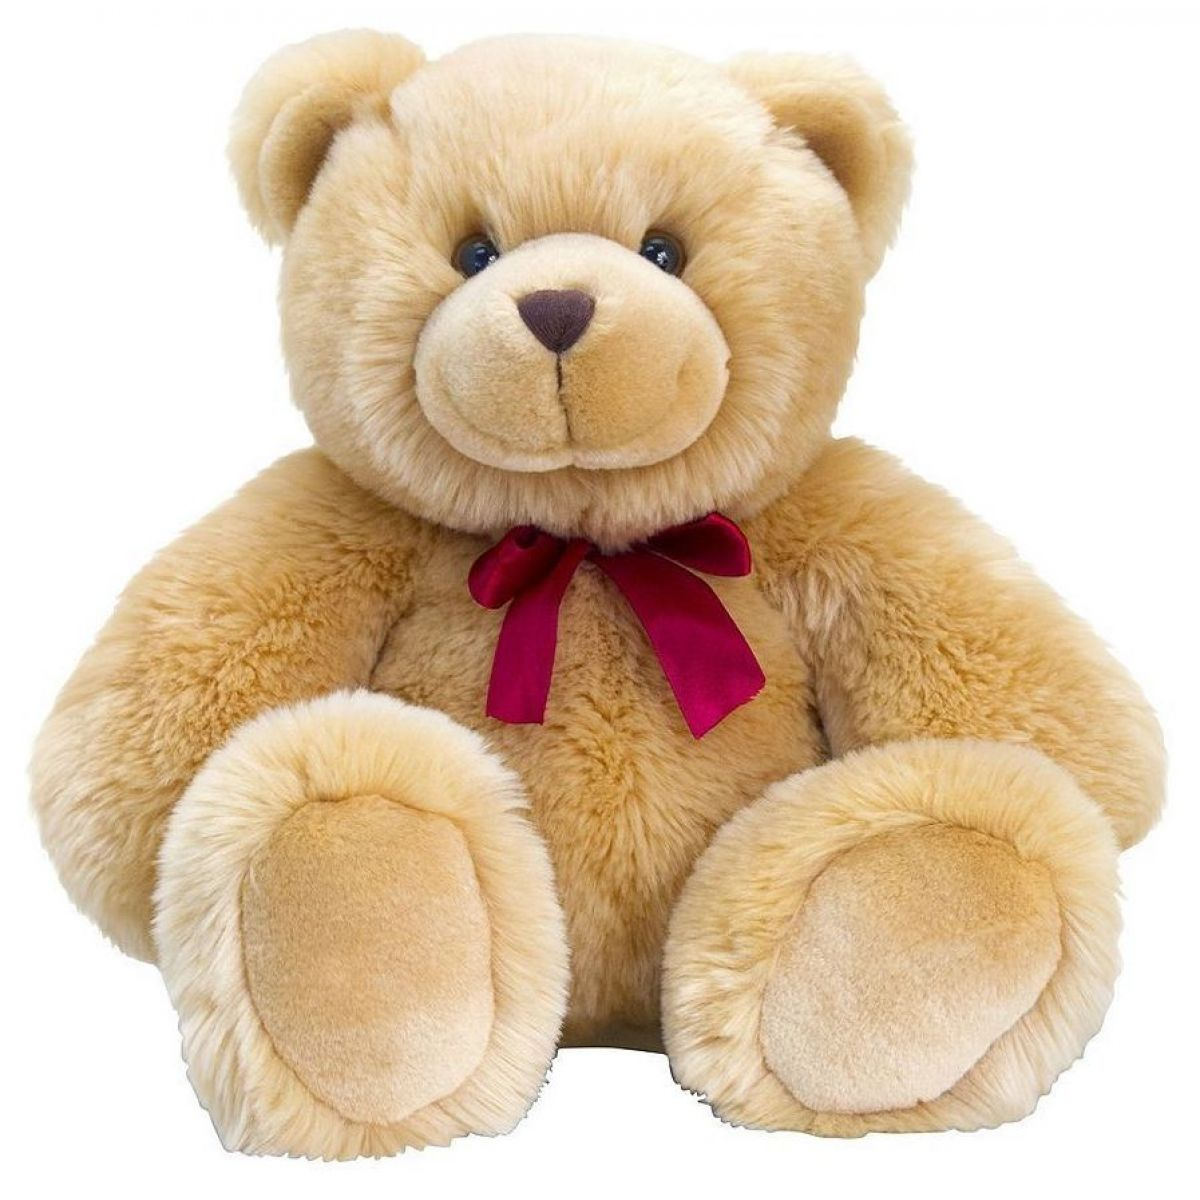 Keel Medvídek Harry 35 cm hnědý